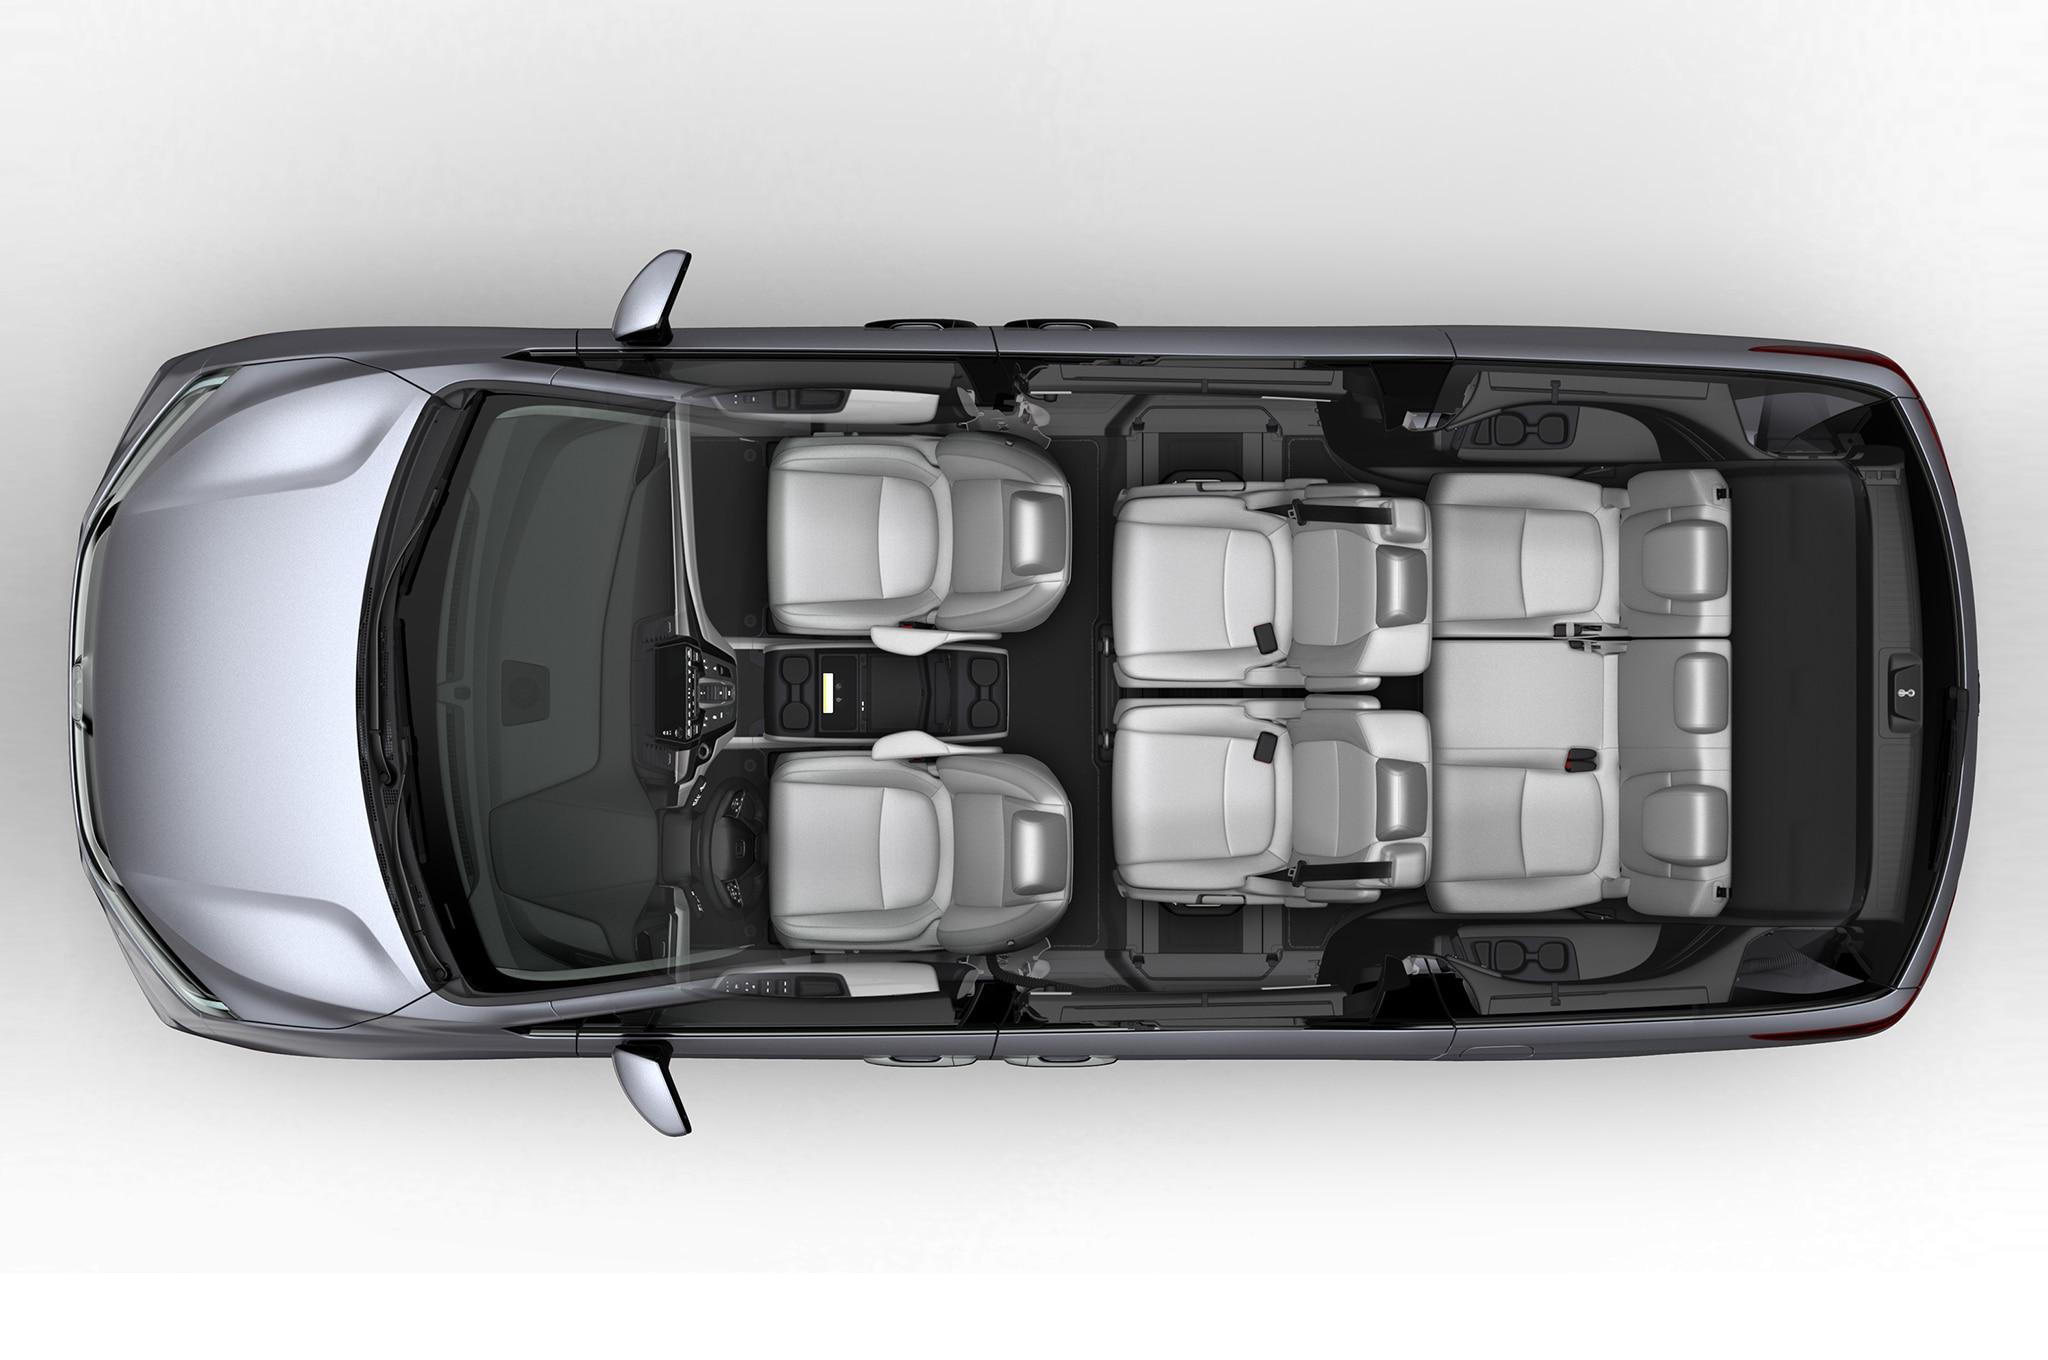 2018 honda odyssey interior top view 04 motor trend en espa ol 2018 honda odyssey touring elite interior